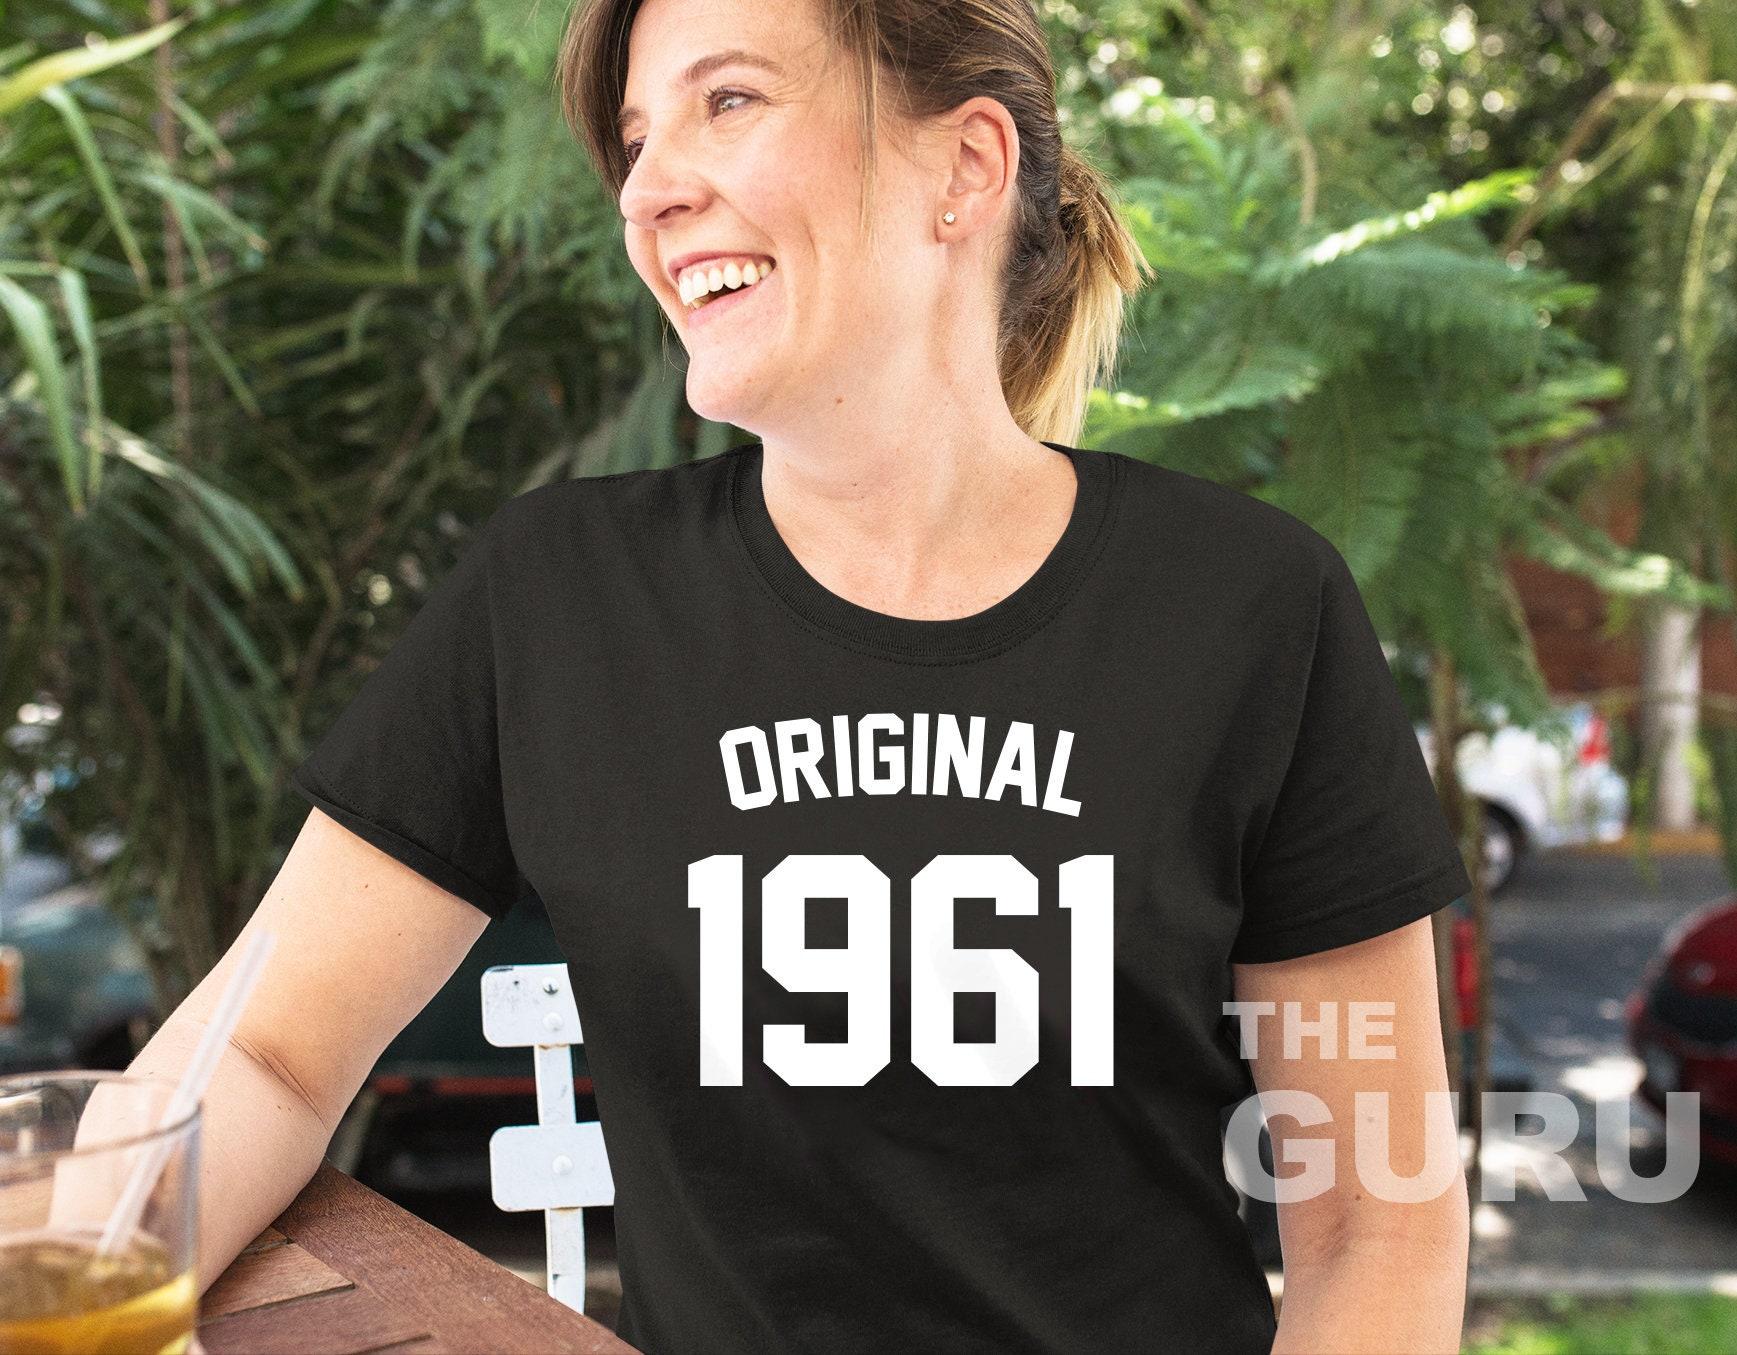 57 birthday shirt 1961 birthday birthday 1961 shirt 57 birthday gift for women 57th birthday gift 57th birthday shirts 1961 birthday gift 57 birthday 116662